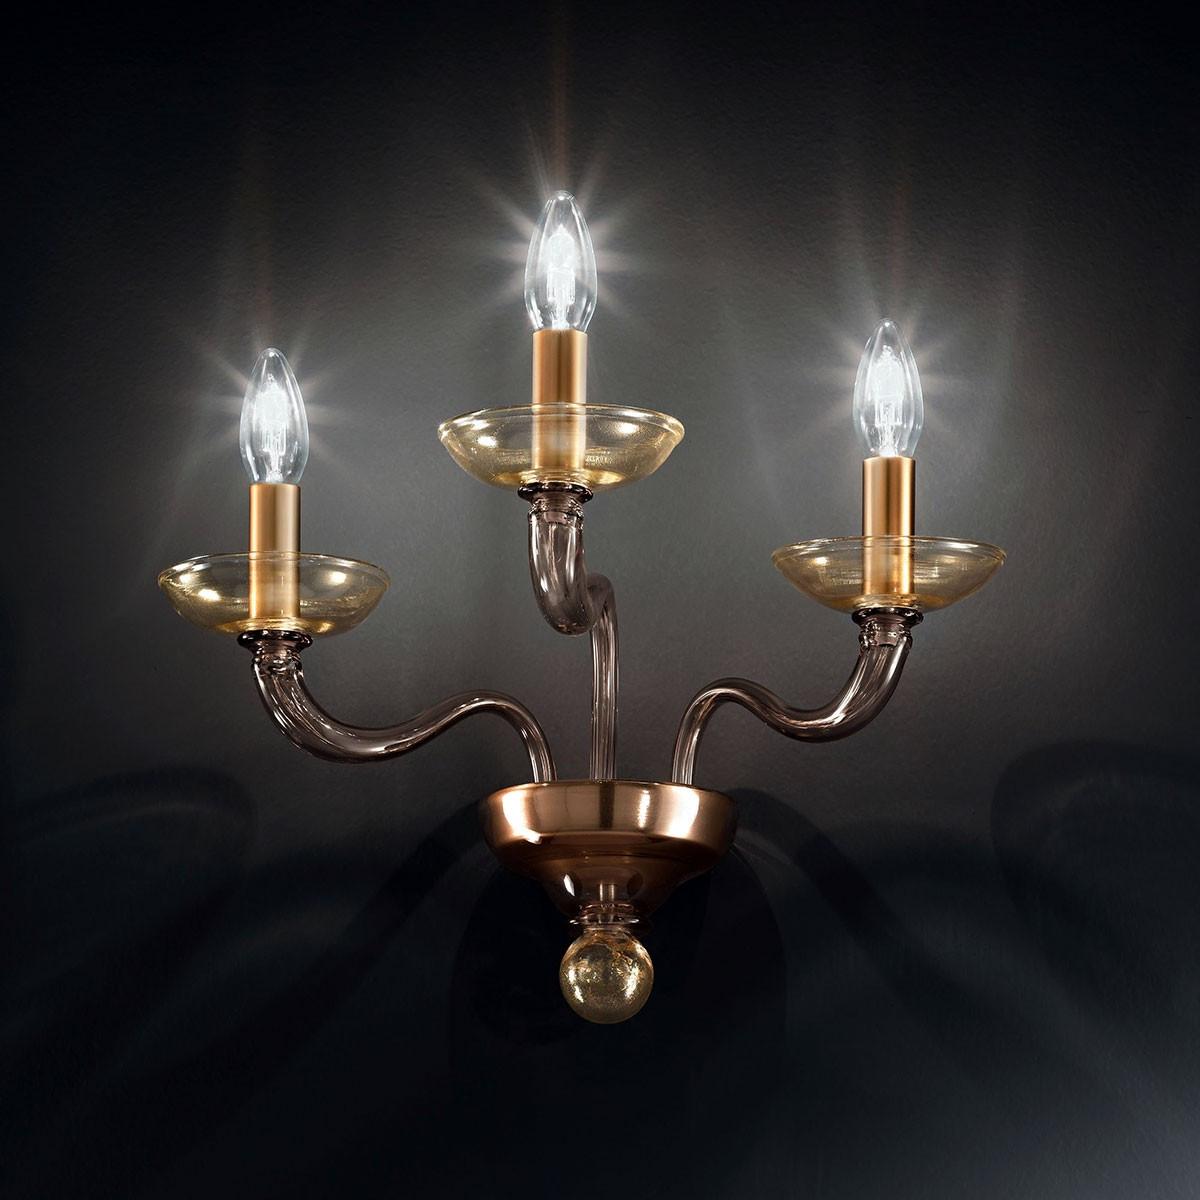 """Tibaldo"" applique en verre de Murano - 3 lumières - gris et or"